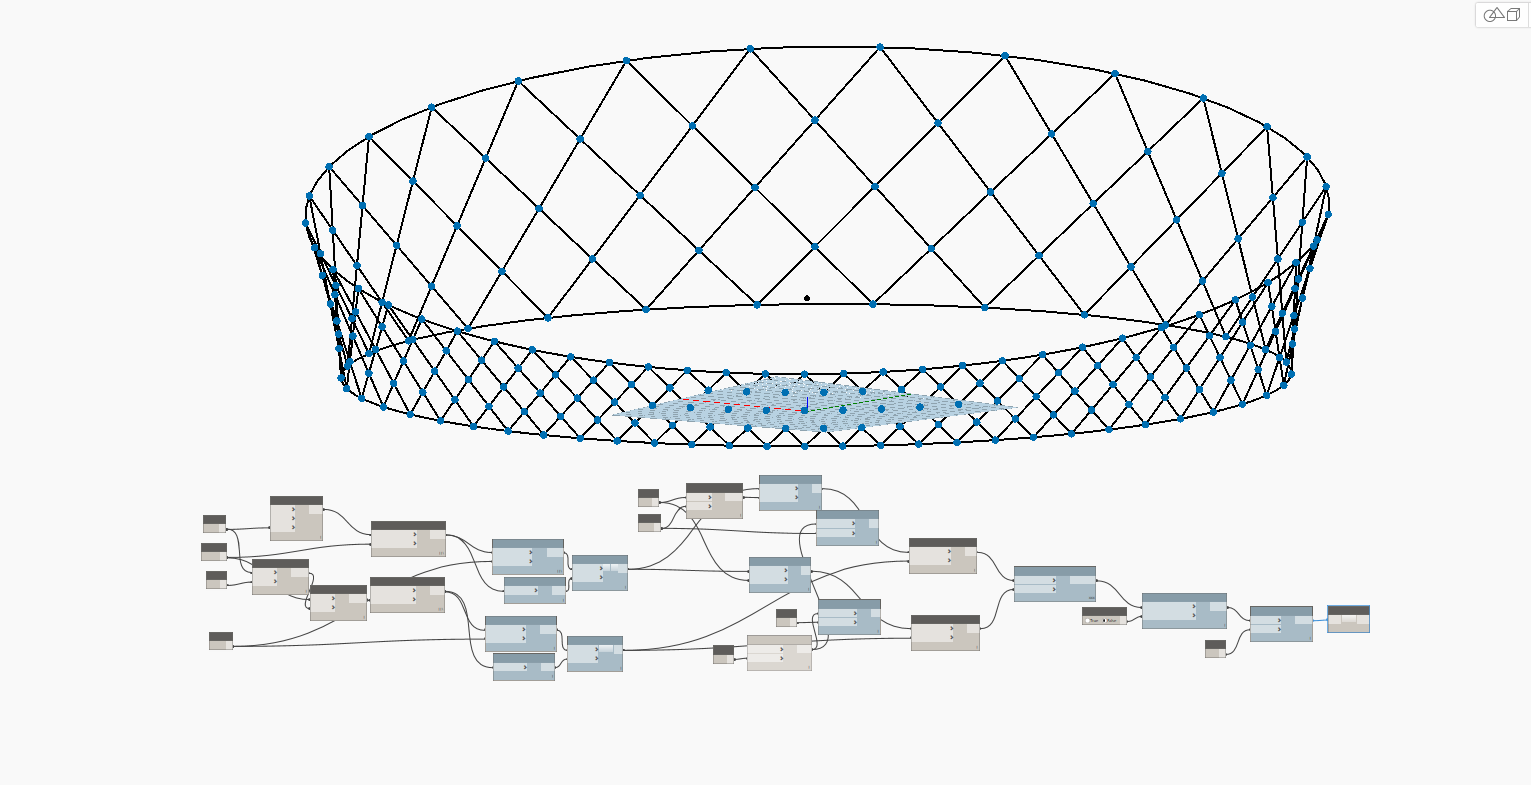 Volgograd Arena - Parametric design tutorial with Revit, Dynamo